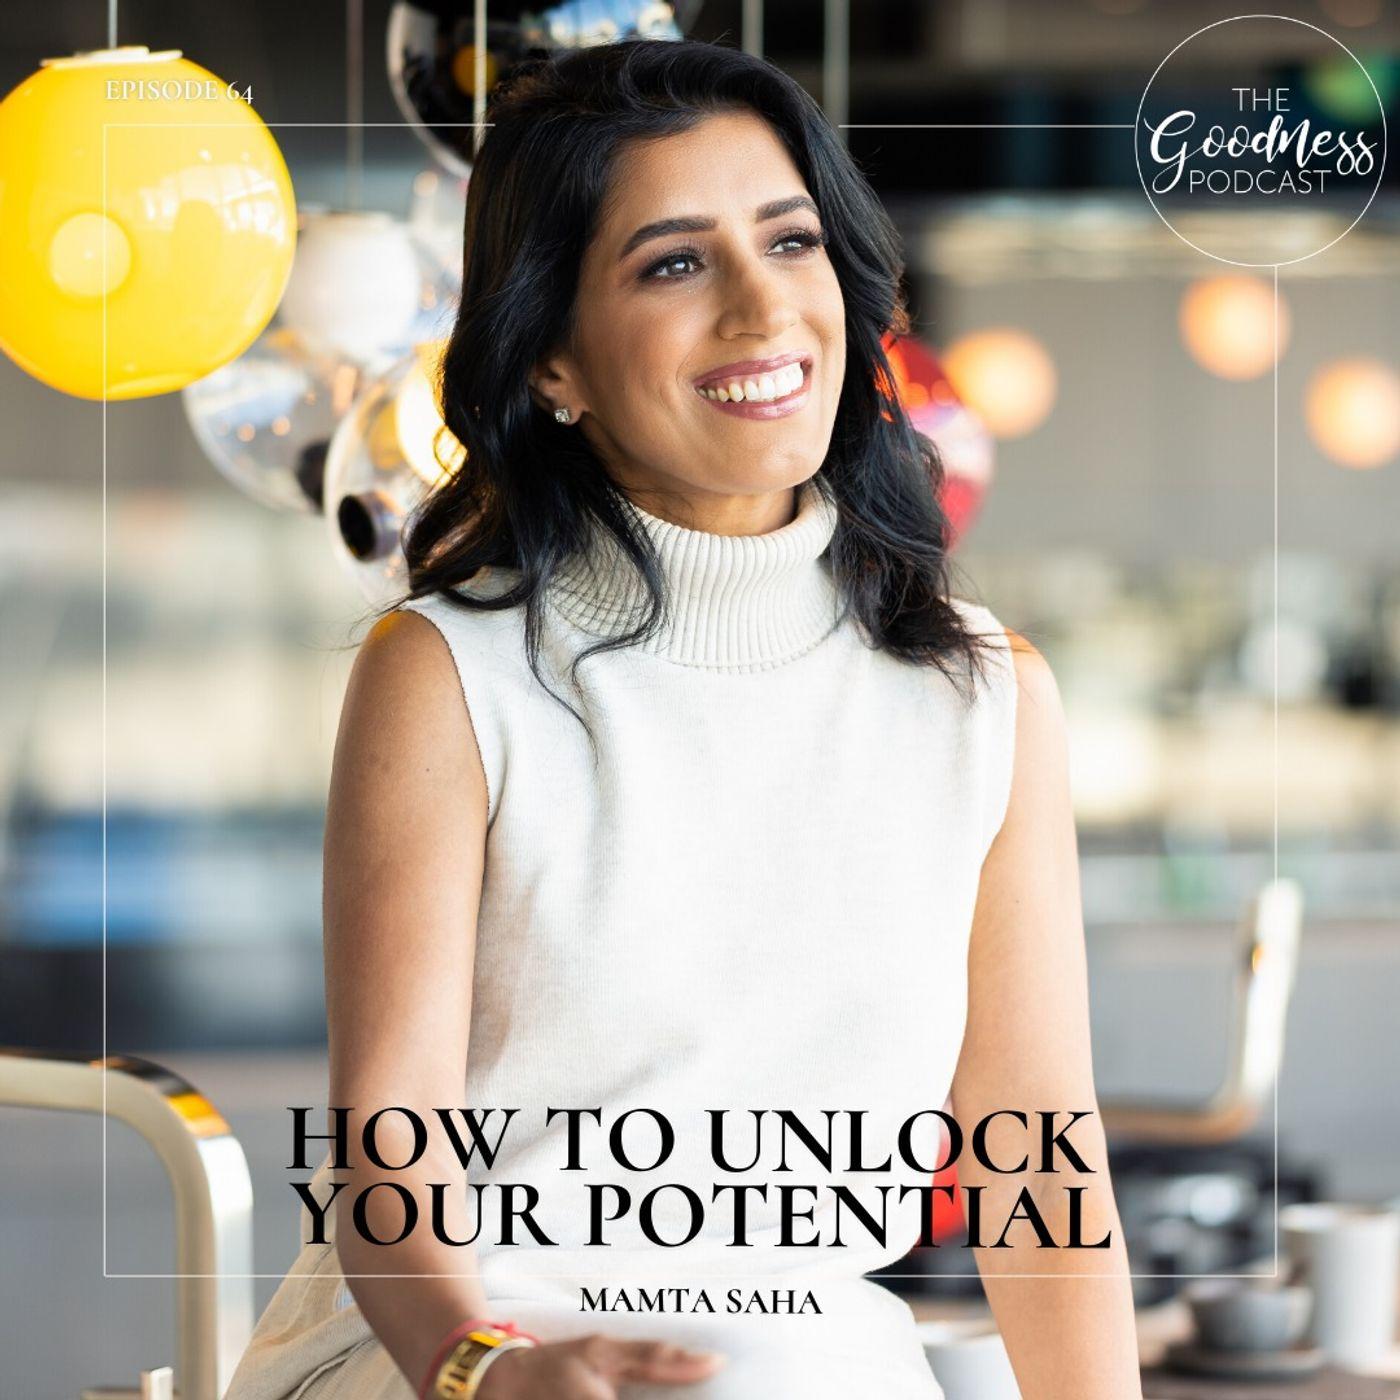 Mamta Saha: How to Unlock Your Potential